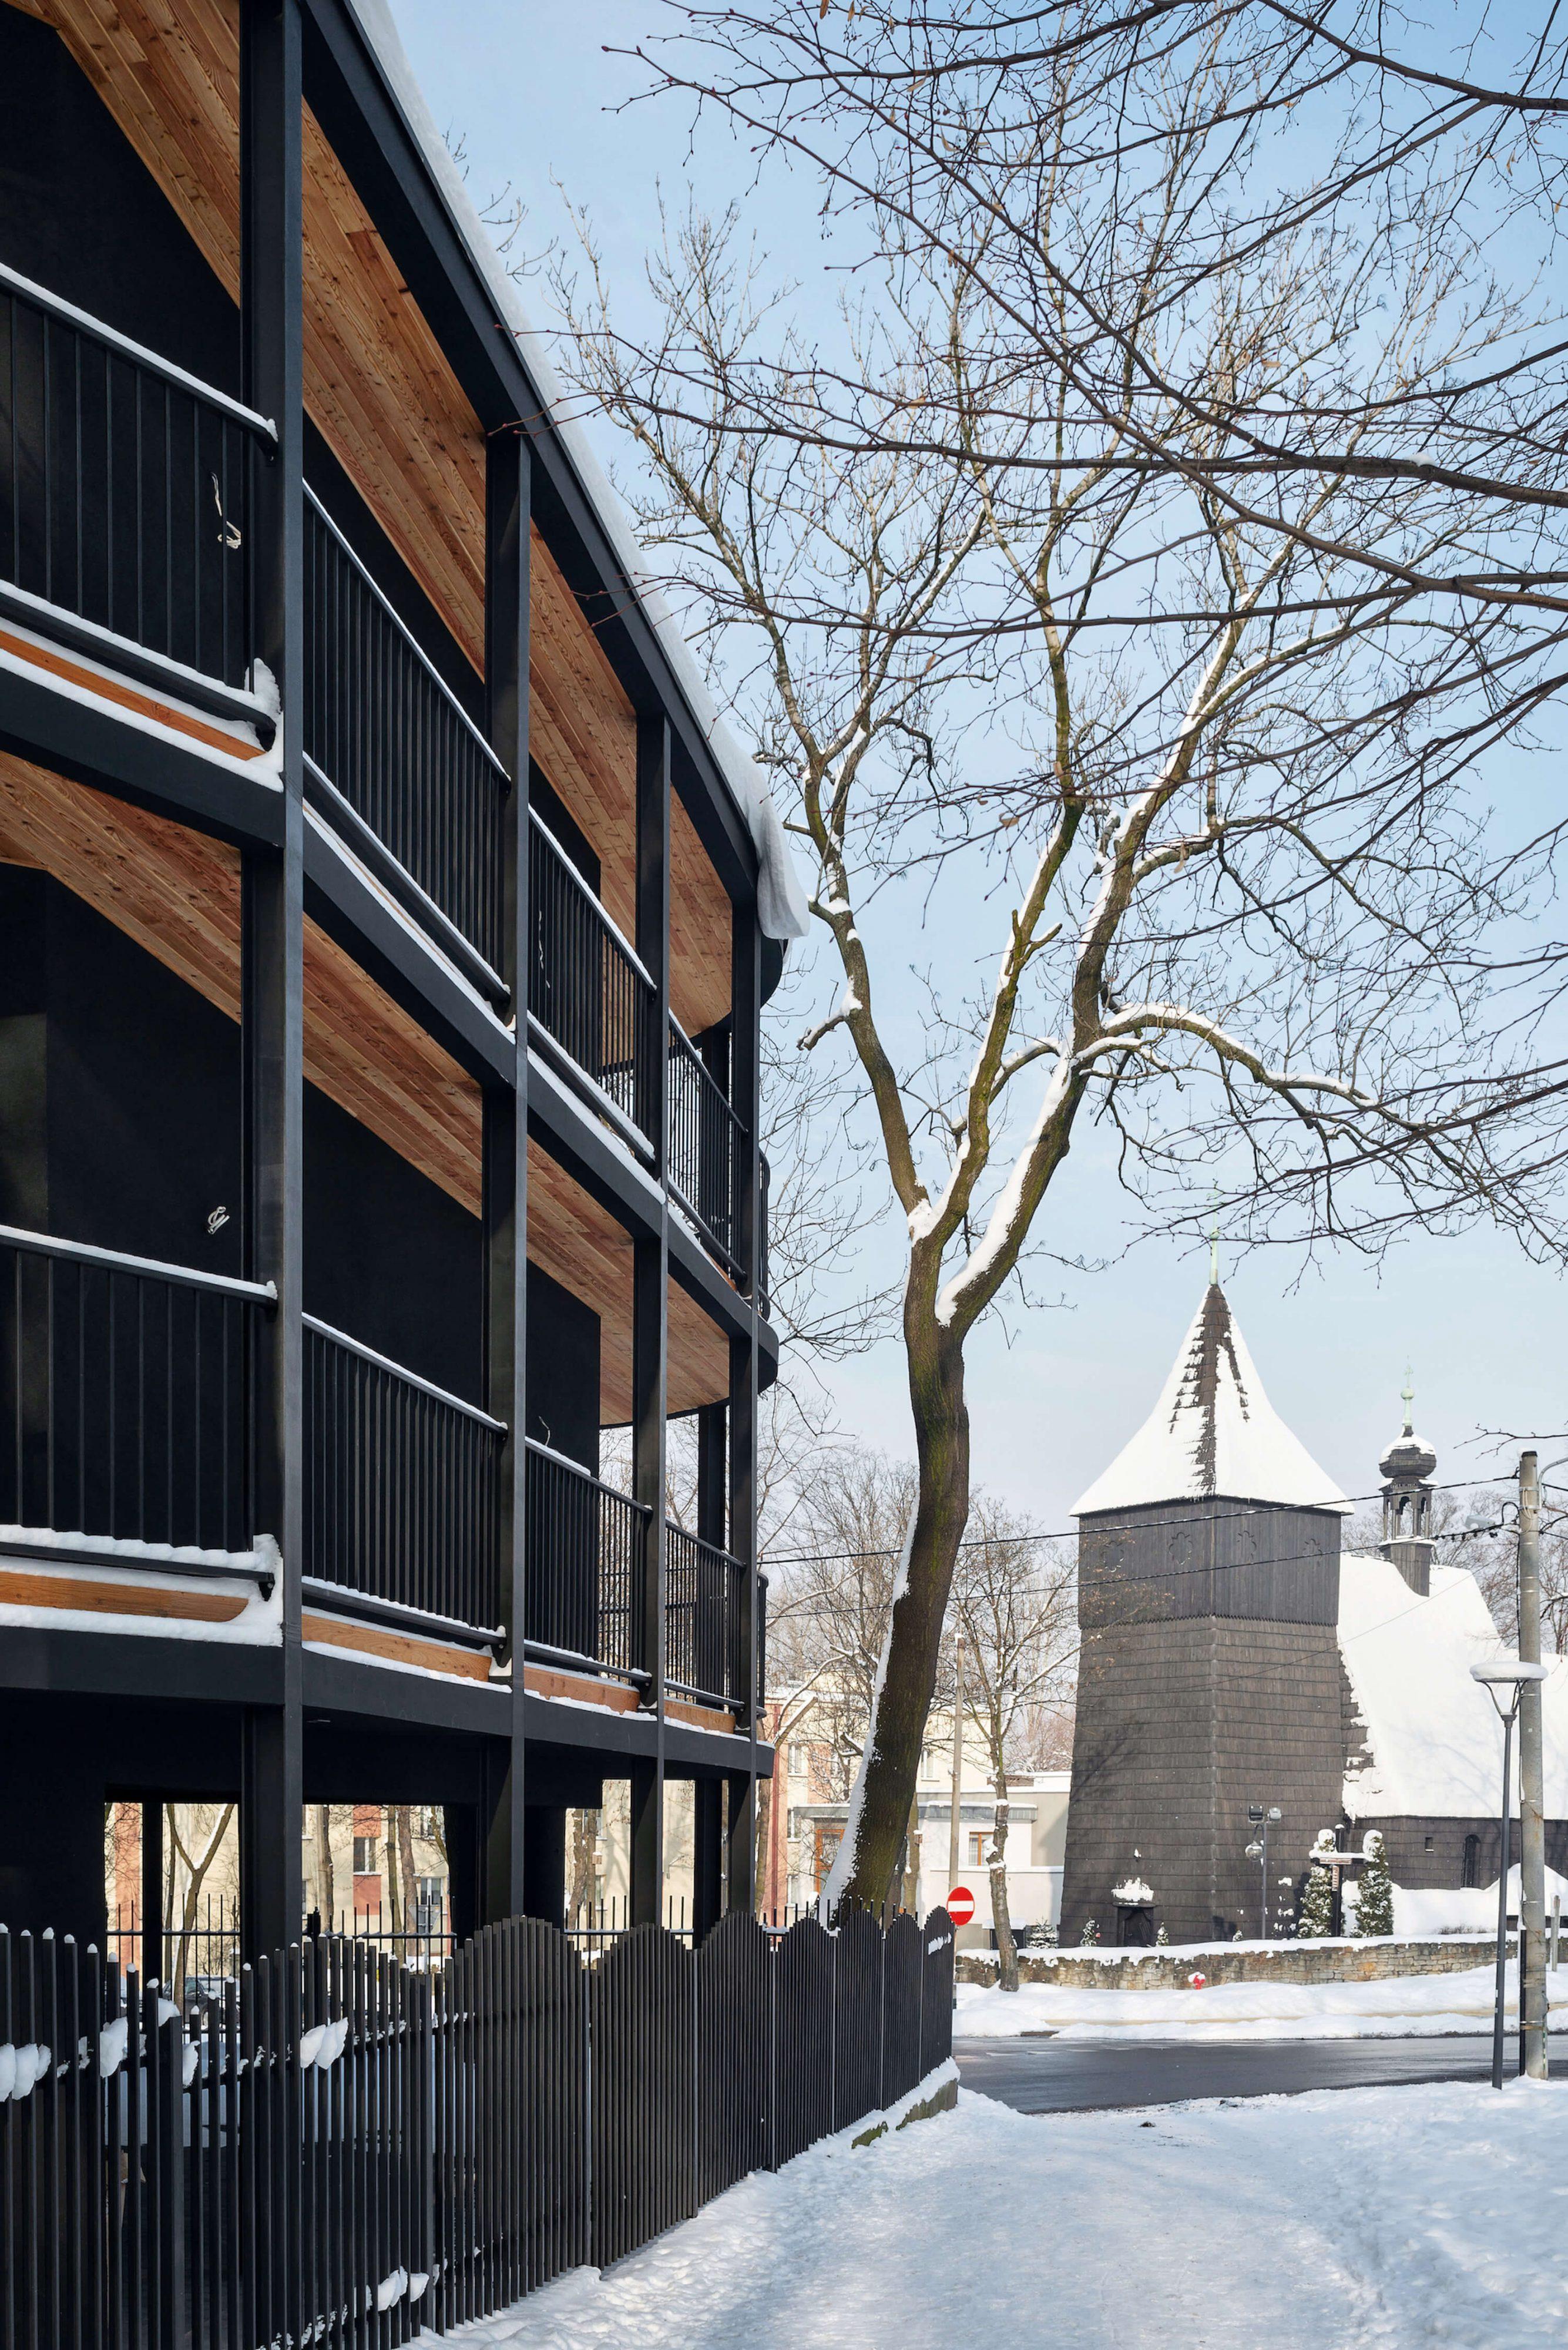 Villa Reden by Architekt Maciej Franta